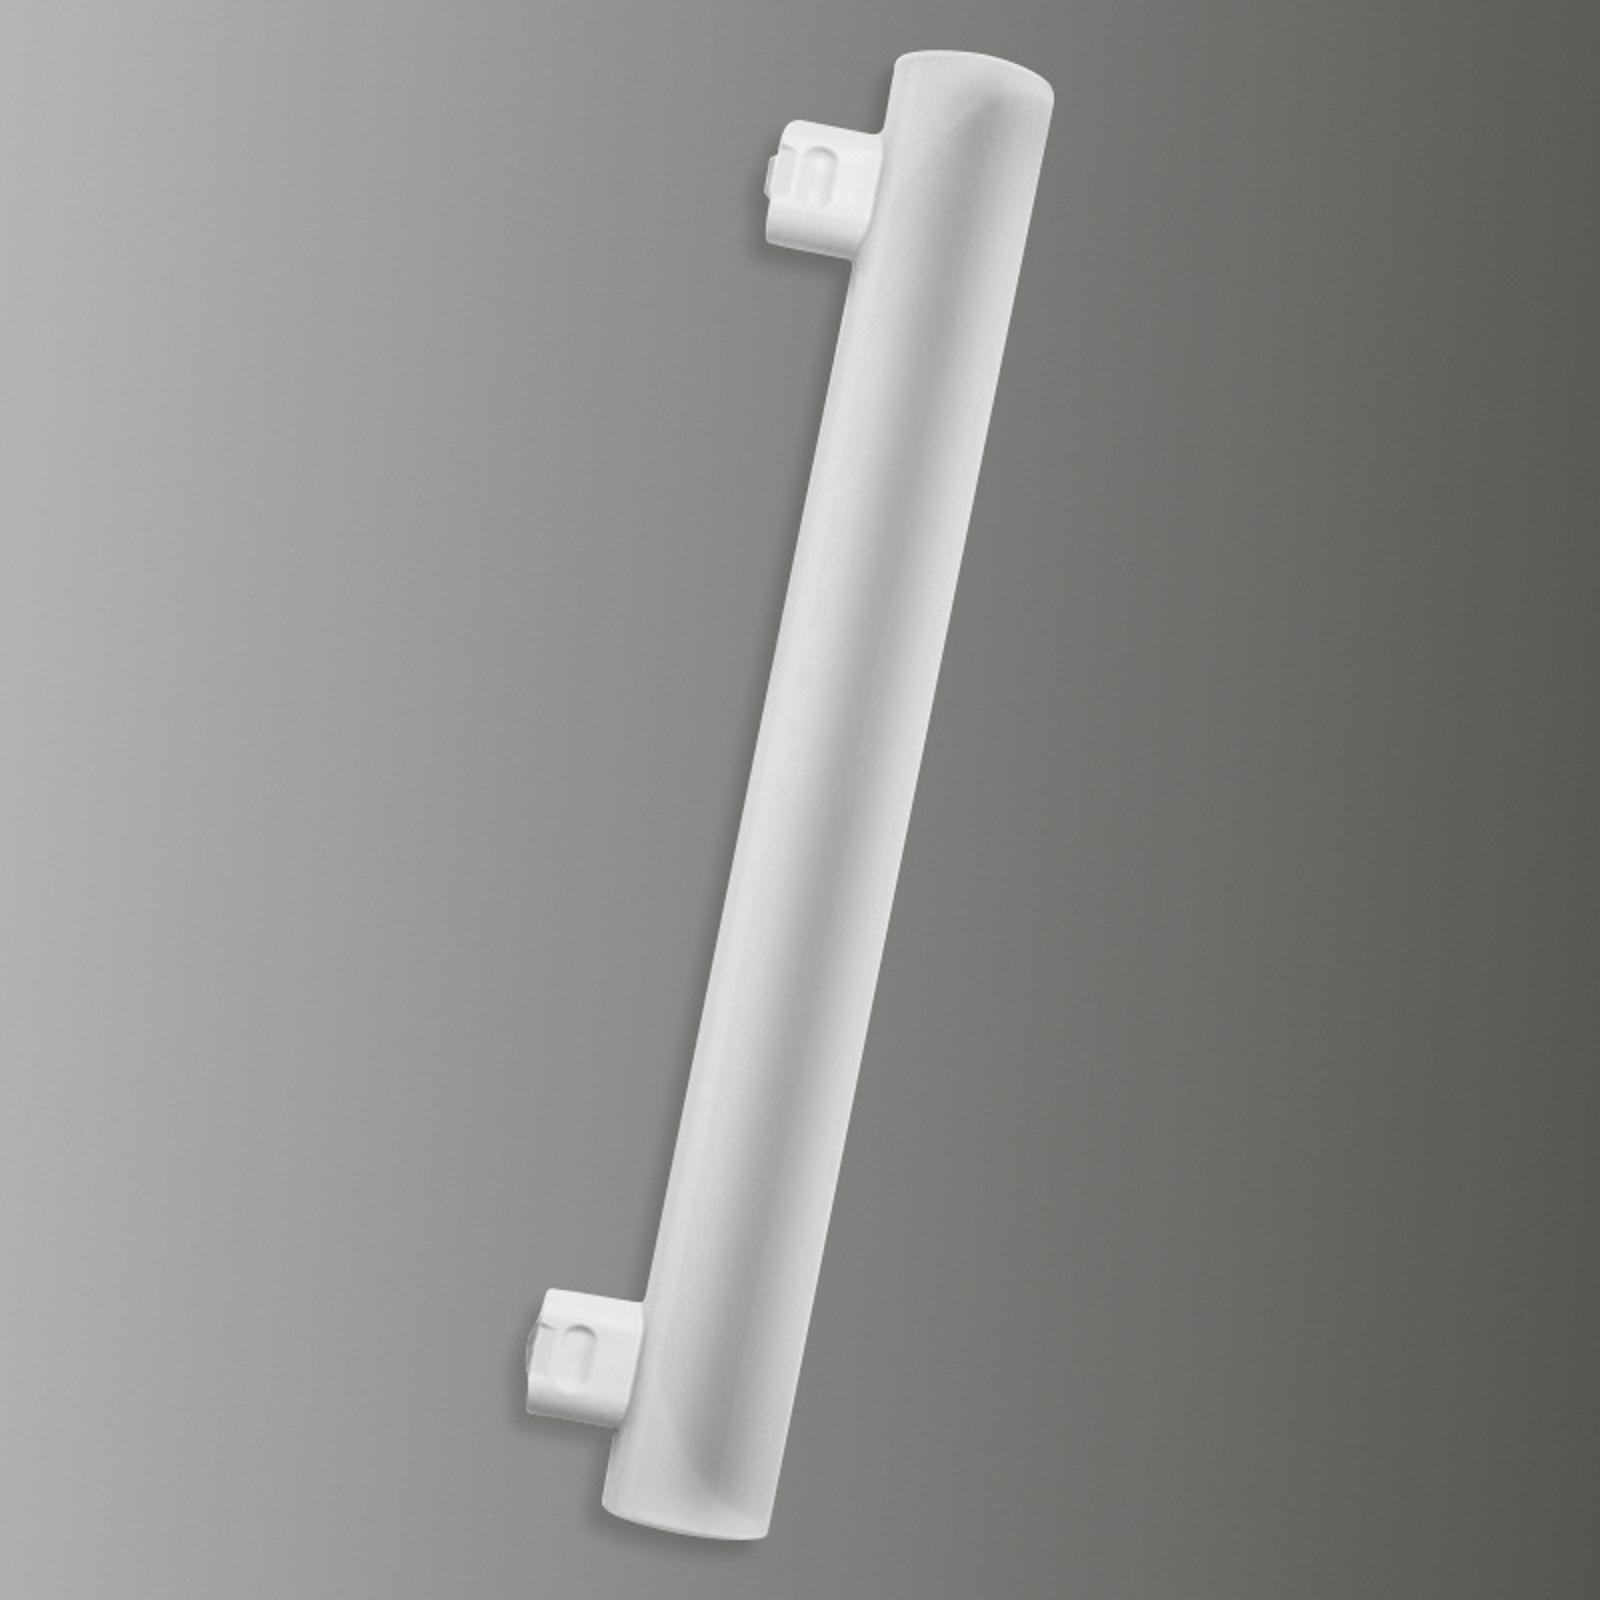 S14s 4W 827 LED-Linienlampe, 2 Sockel, 300 mm